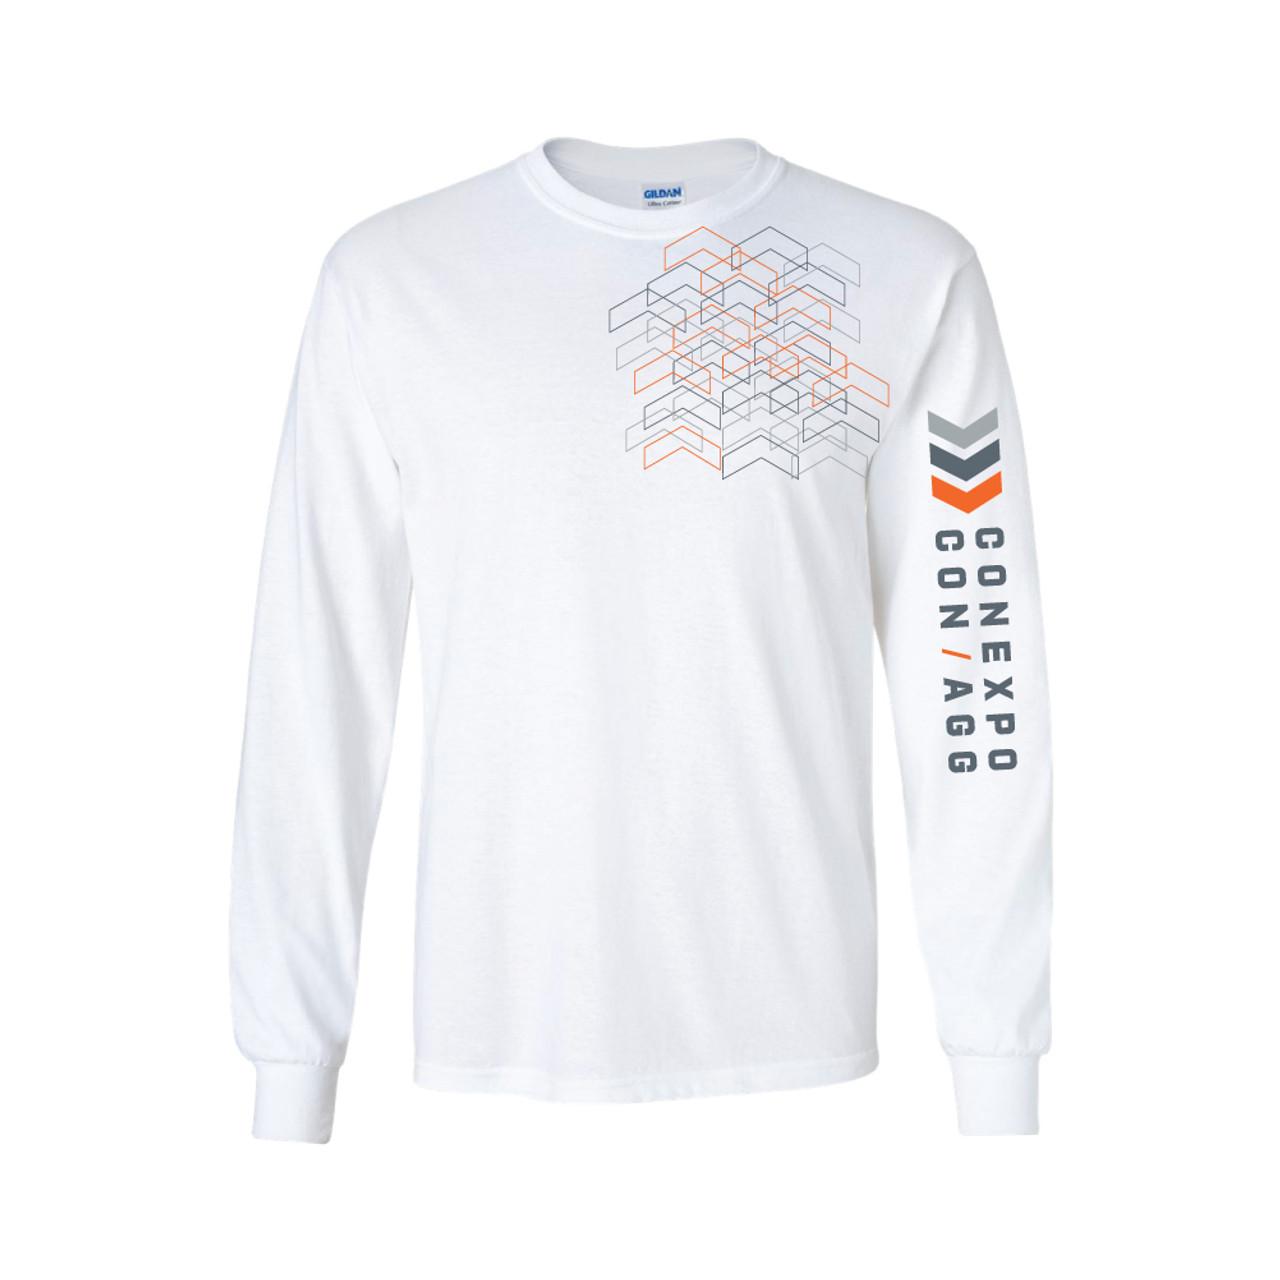 Unisex White Fine Jersey Long-Sleeve T-shirt